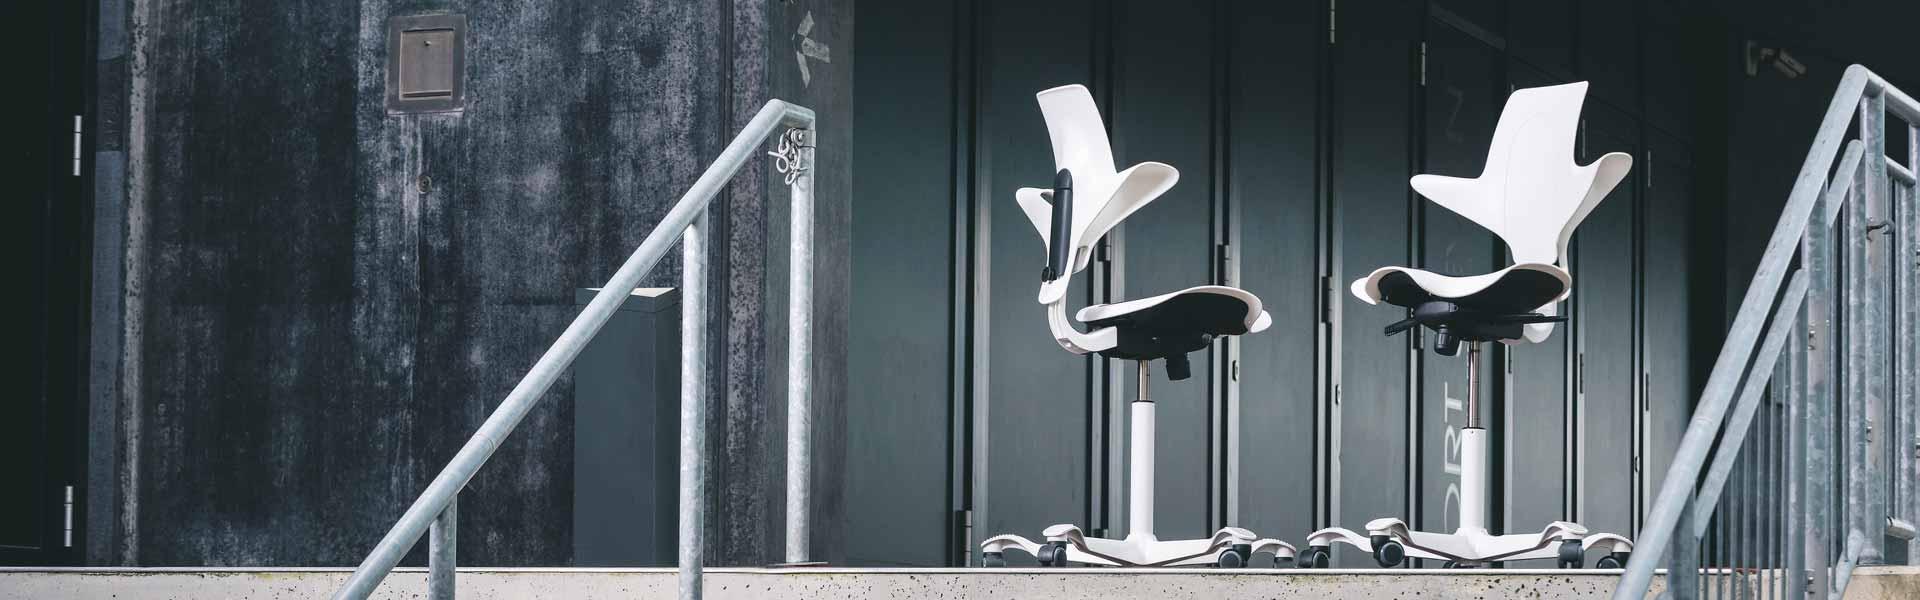 orthop dische ergonomische b rost hle aus berlin home. Black Bedroom Furniture Sets. Home Design Ideas